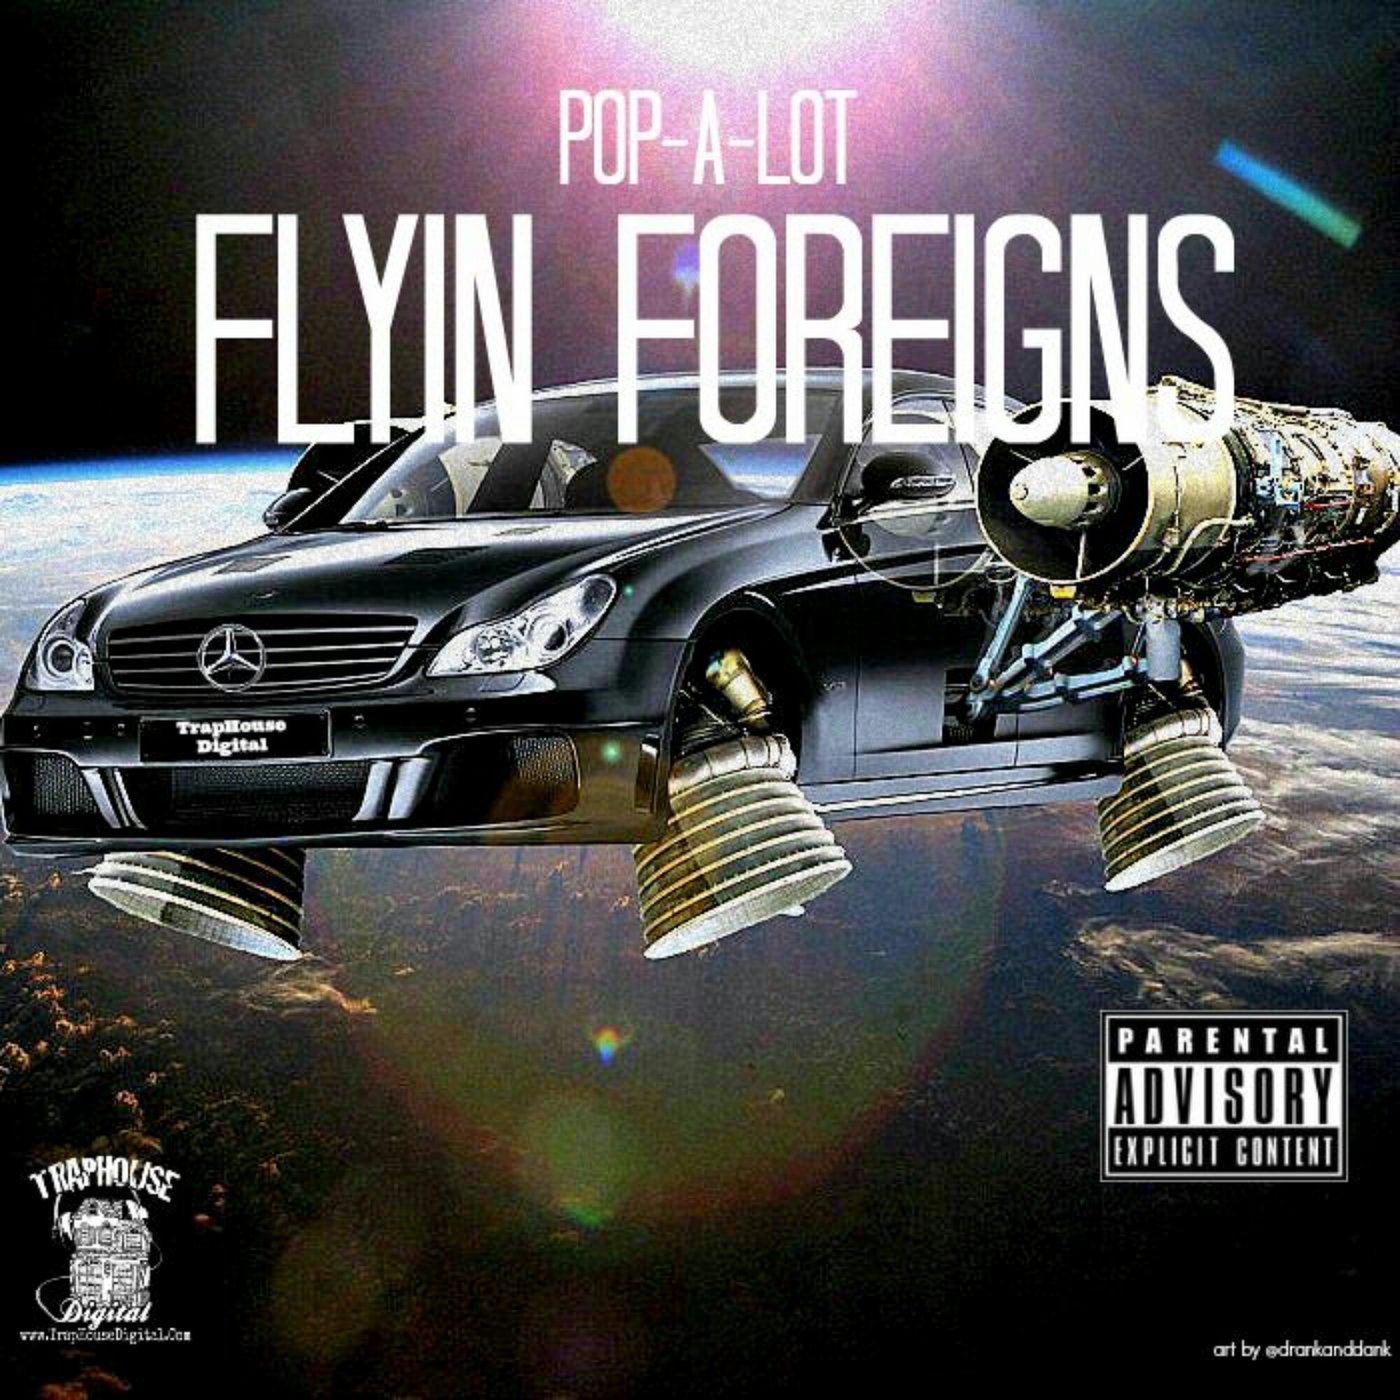 FlyinForeignsJPG